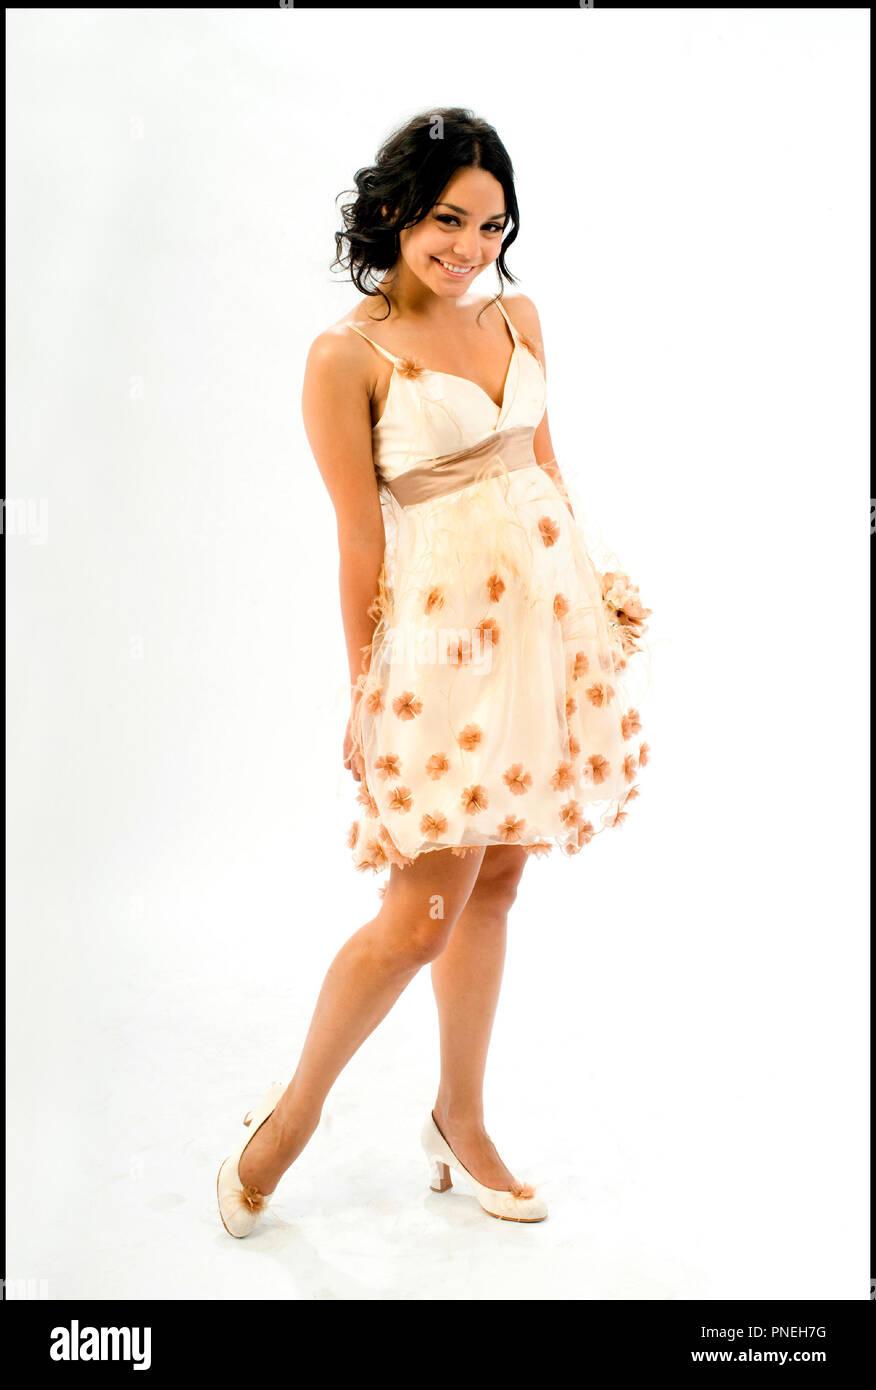 4797e8e93 Vanessa Hudgens High School Musical Stock Photos   Vanessa Hudgens ...